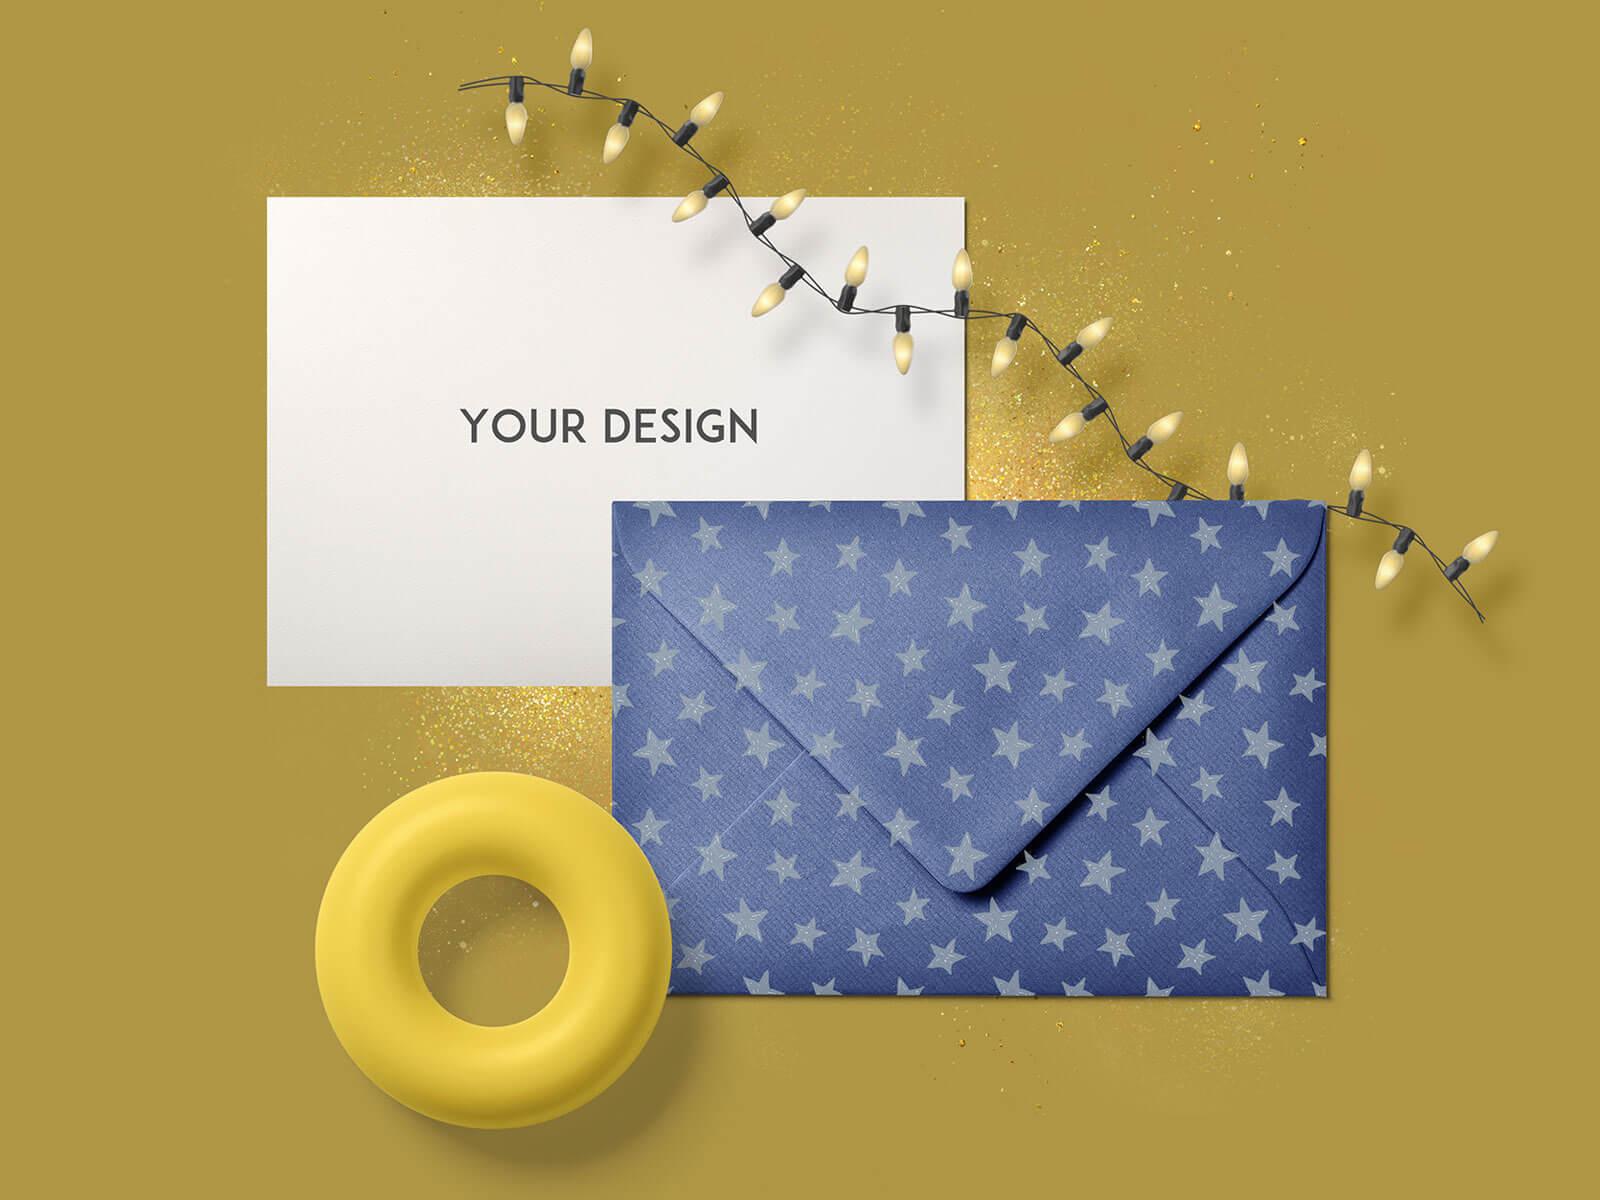 10 Free Greetings Card & Envelope Mockup PSD Set (1)